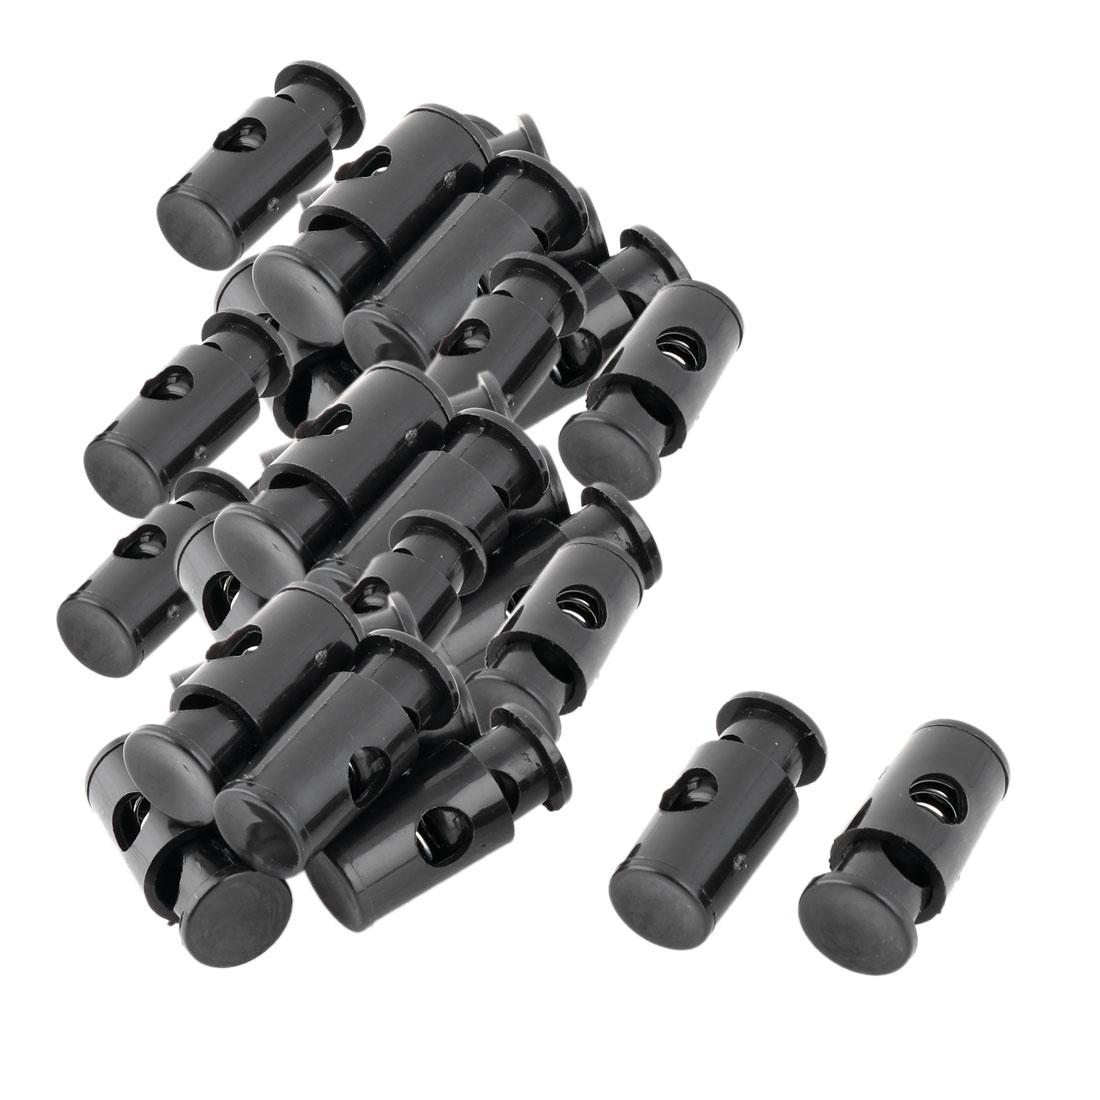 Plastic Spring Loaded Adjustive Clothes Sliding Cord Lock Stopper Black 30pcs